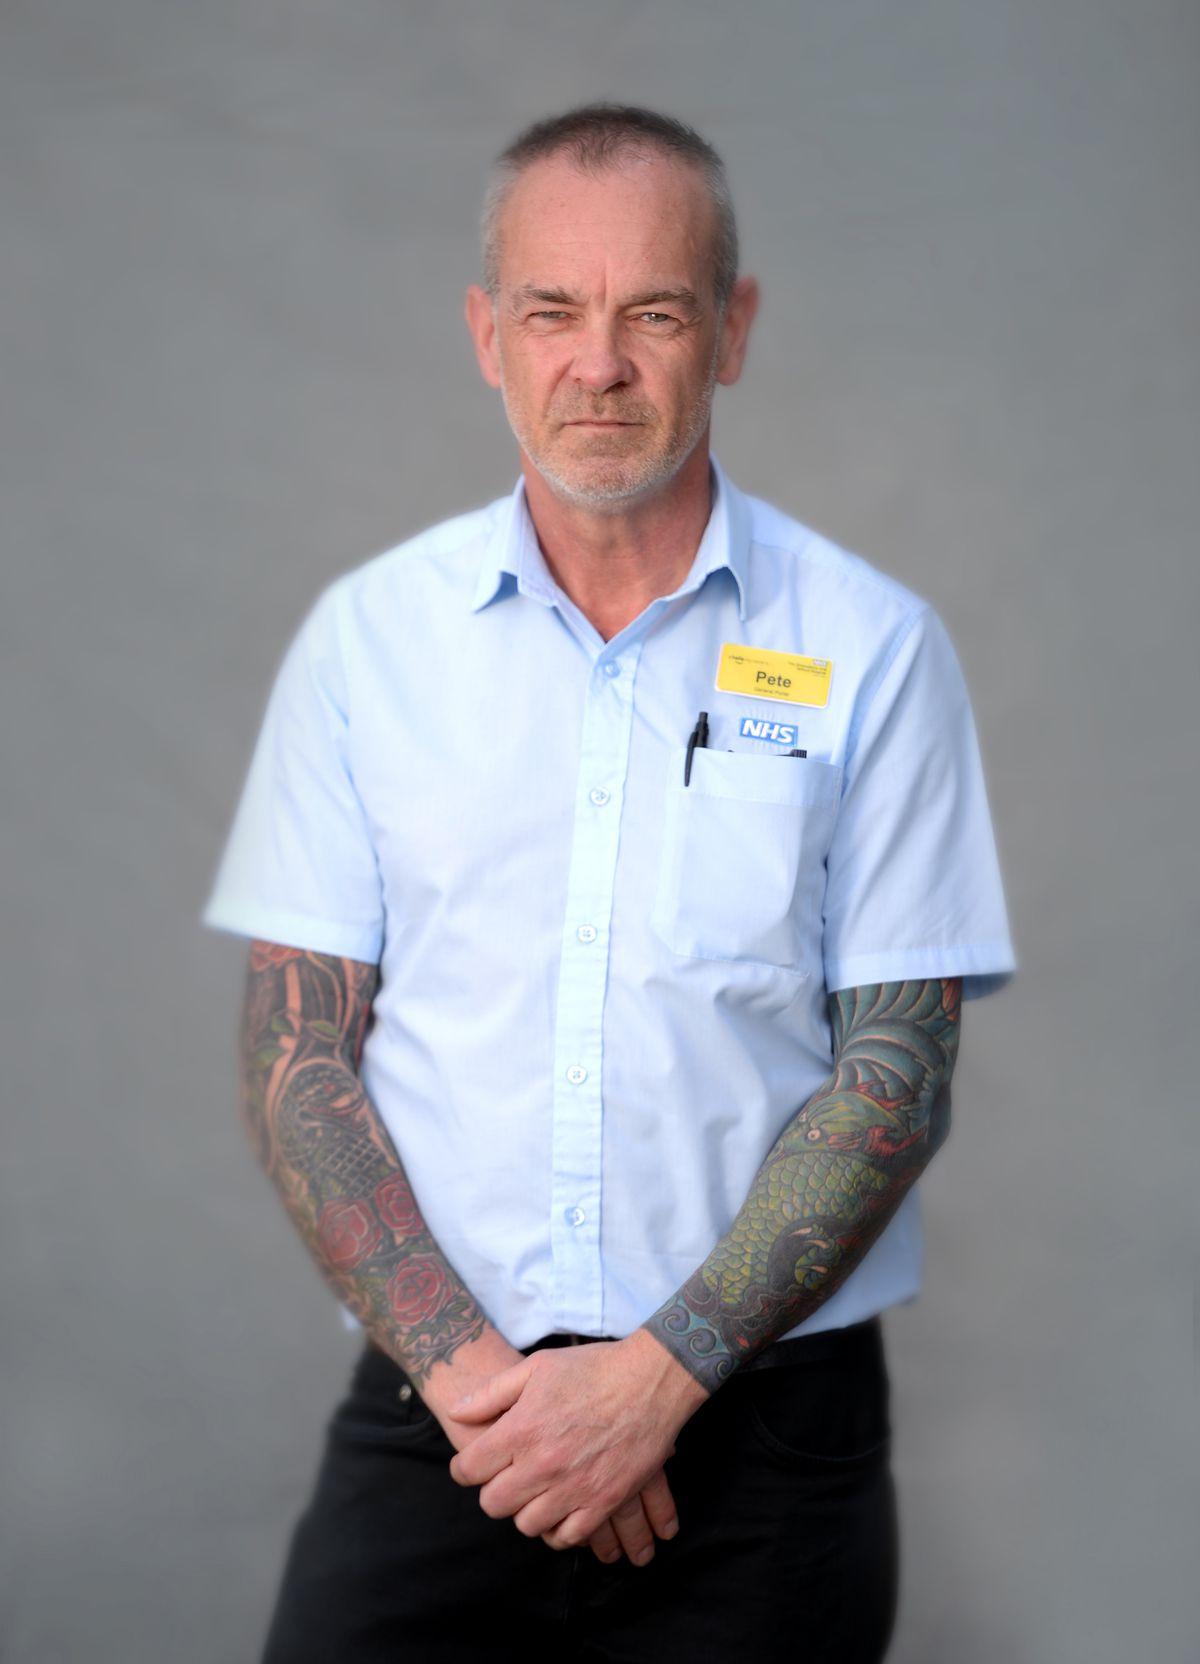 Pete Morris, porter